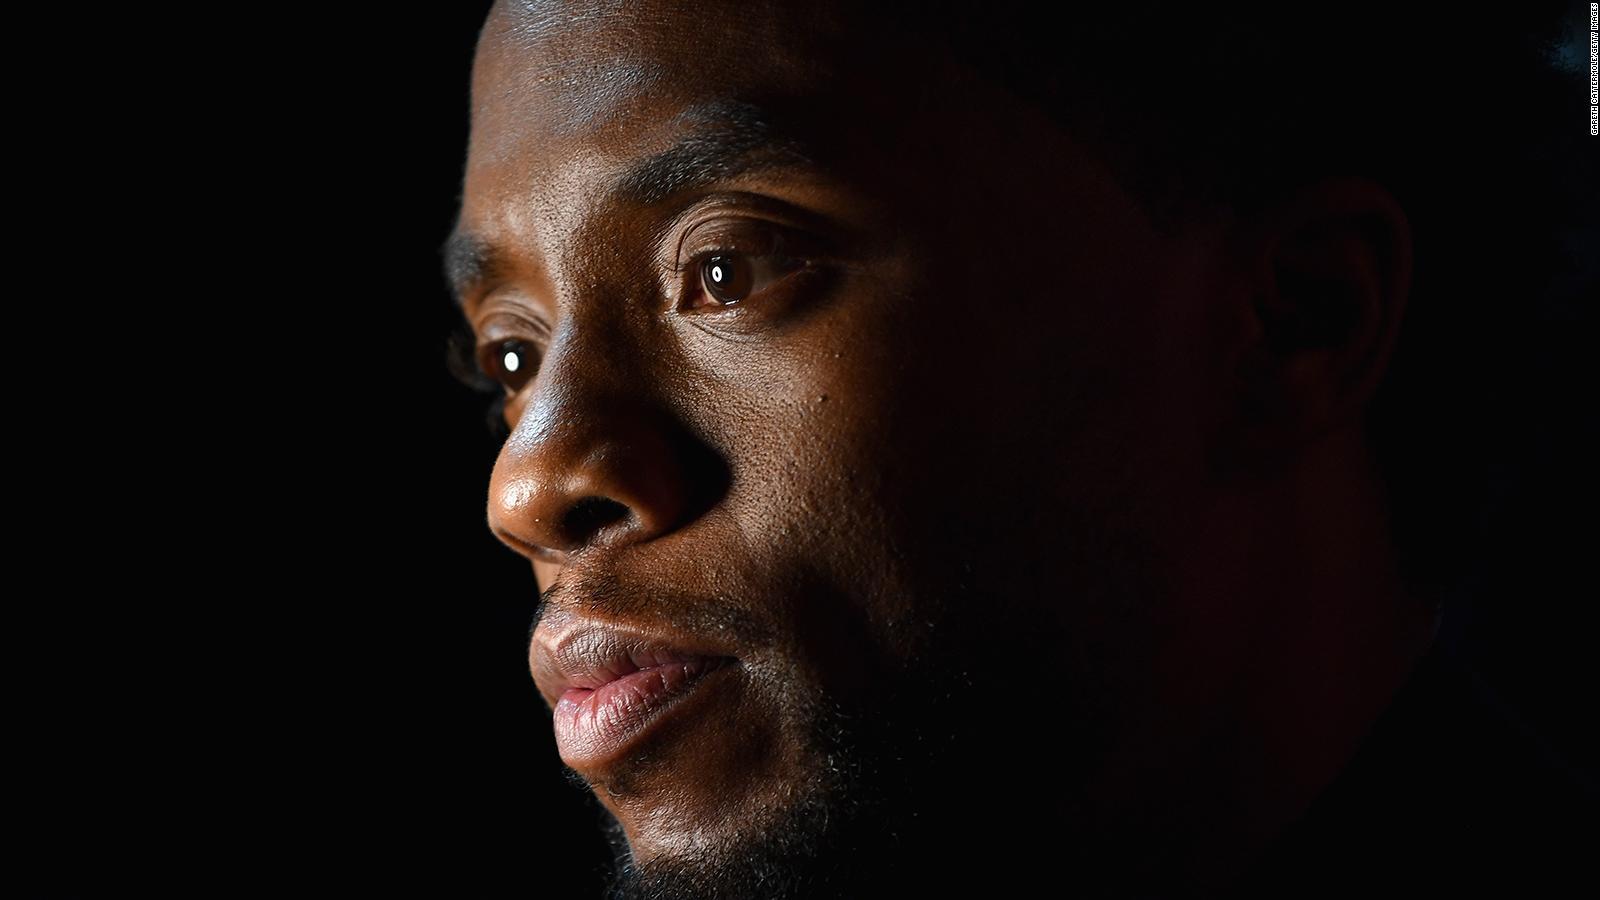 Chadwick Boseman Black Panther Star Has Died Cnn